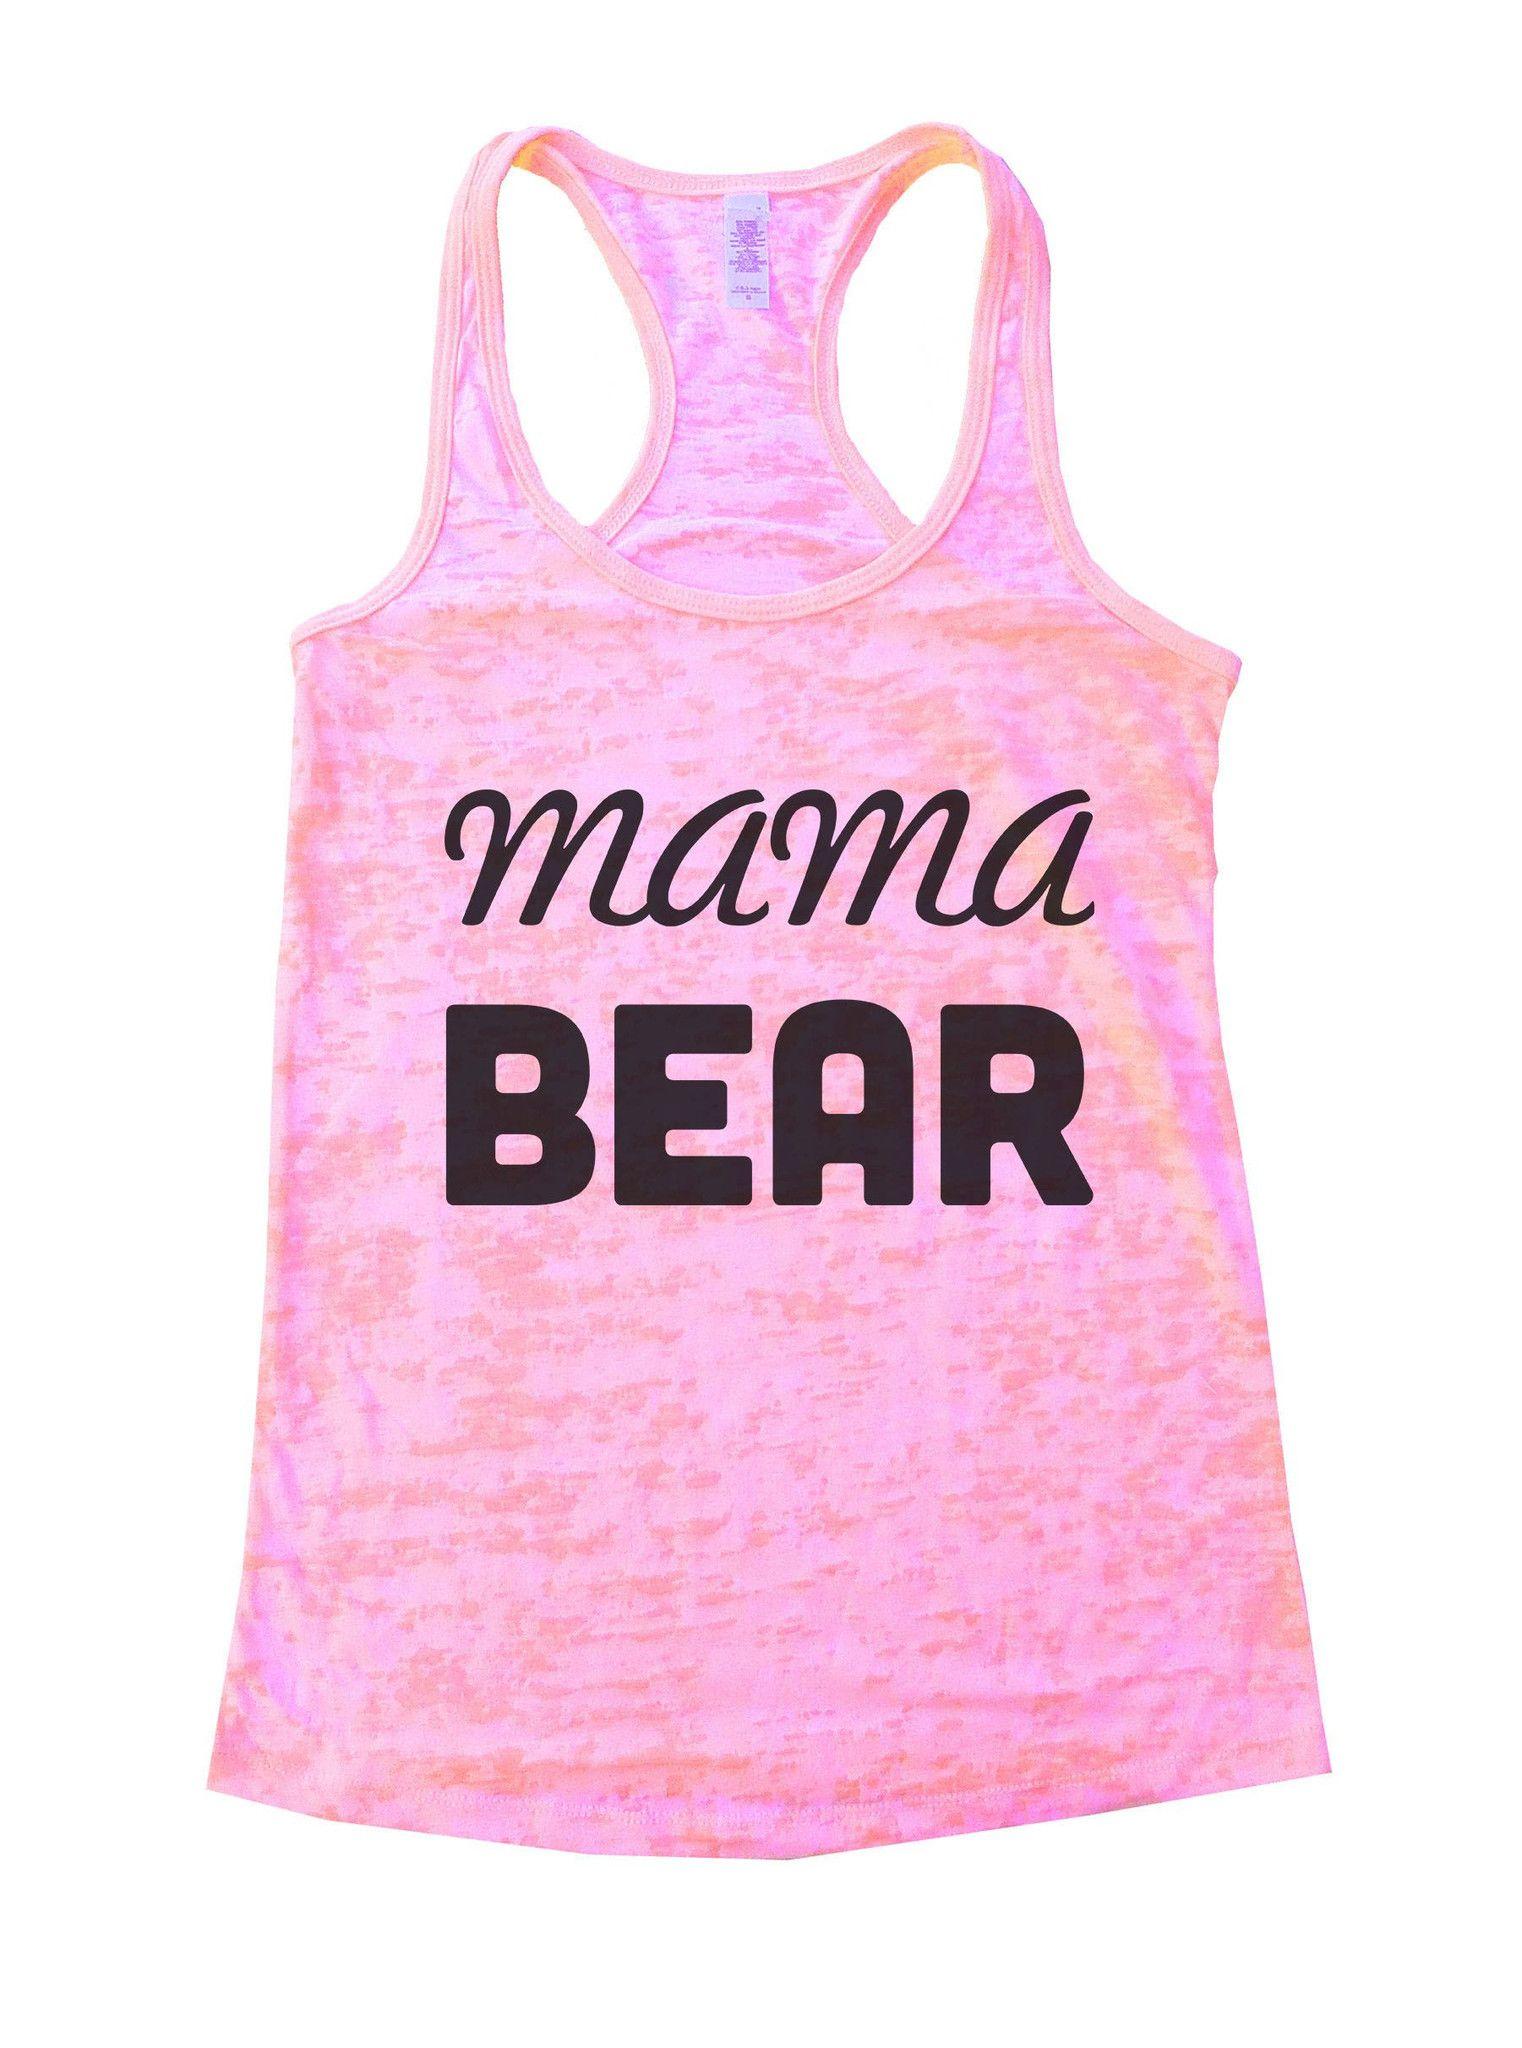 Mama Bear Burnout Tank Top By BurnoutTankTops.com - 876